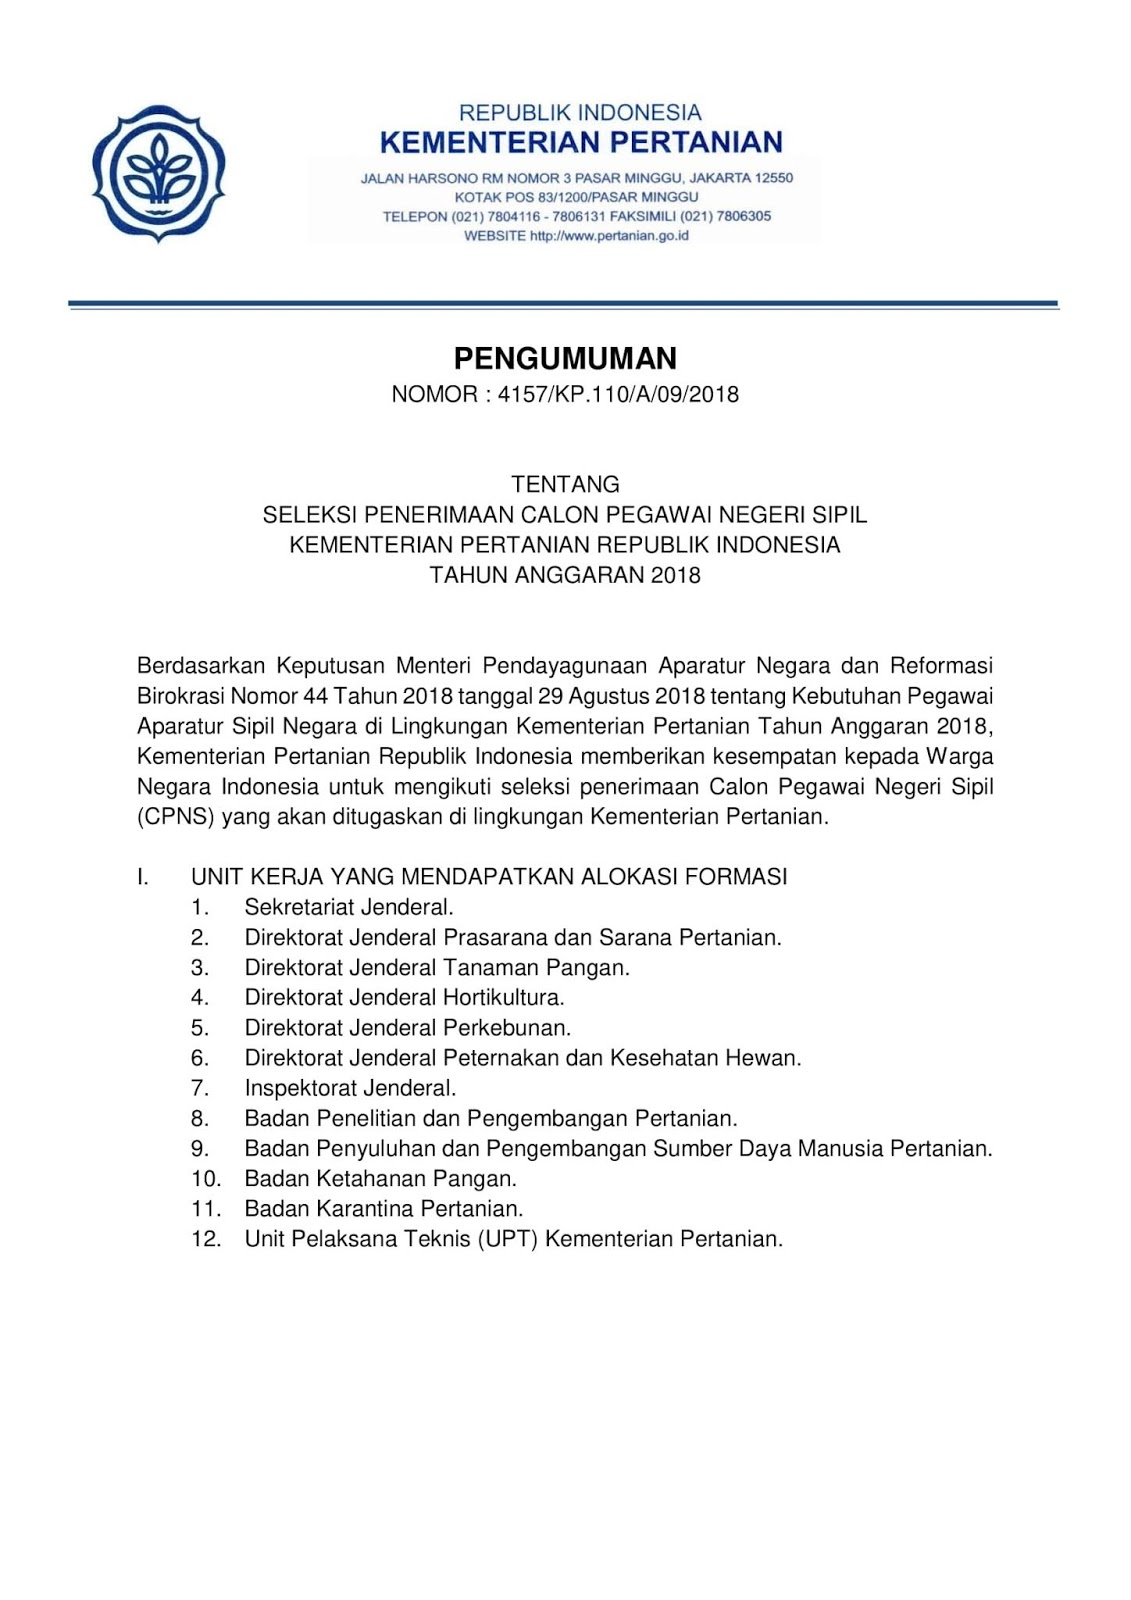 Penerimaan Cpns Kementerian Pertanian Republik Indonesia 835